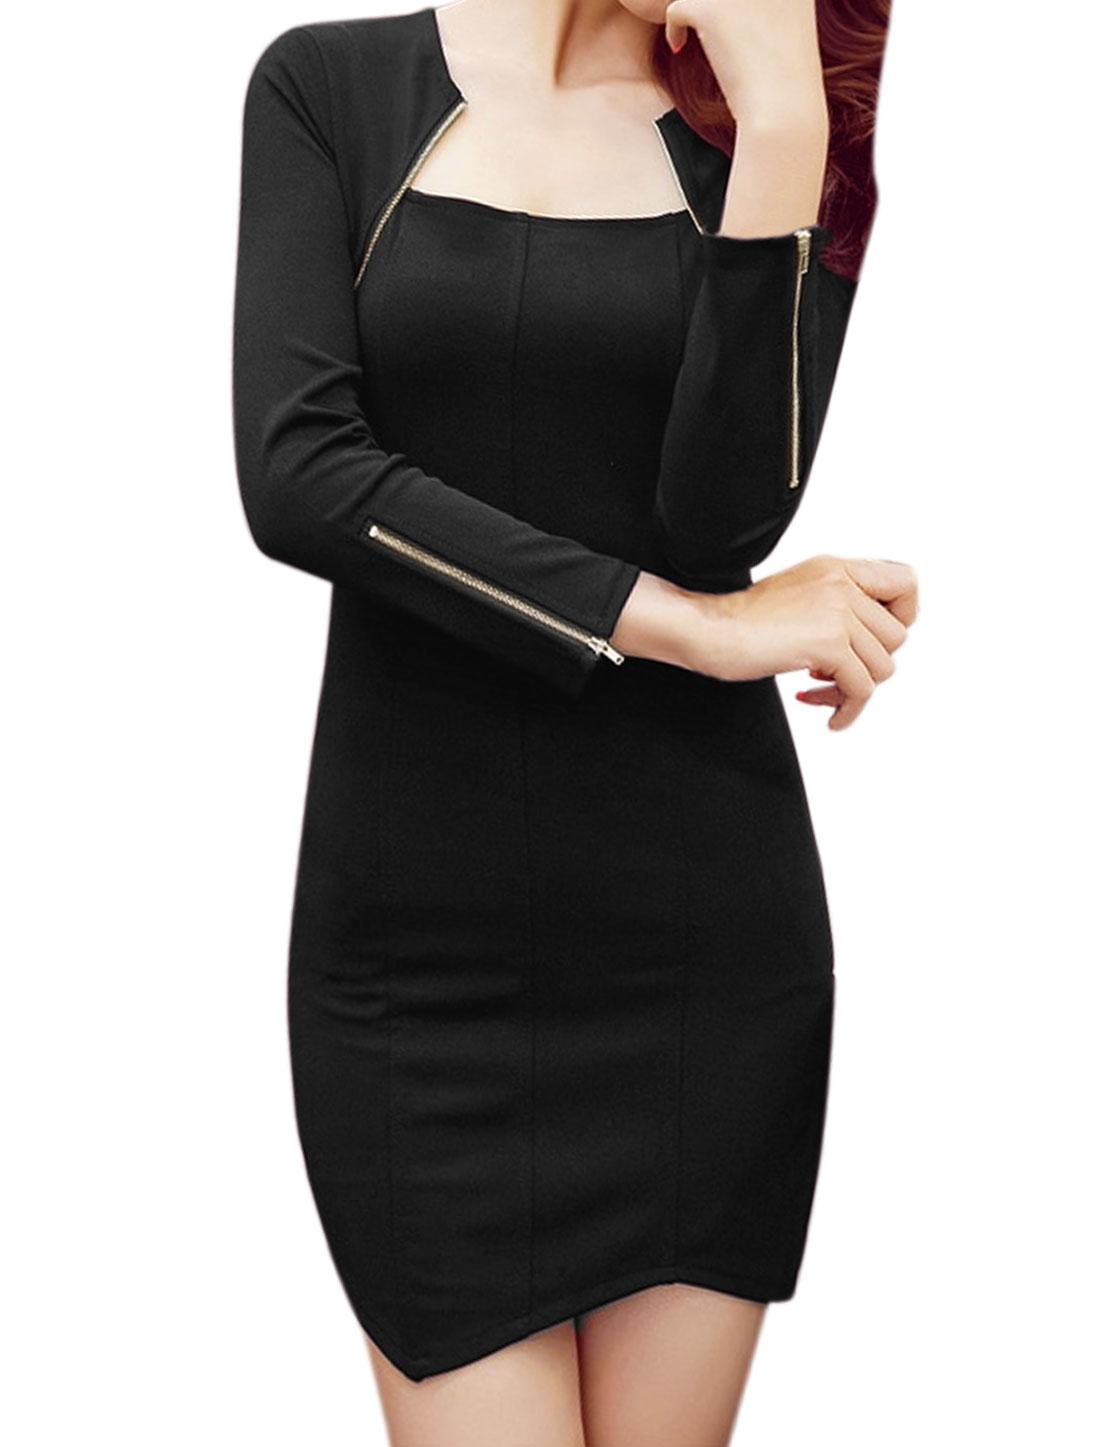 Women Zippered Sleeves Asymmetric Hem Mini Bodycon Dress Black M